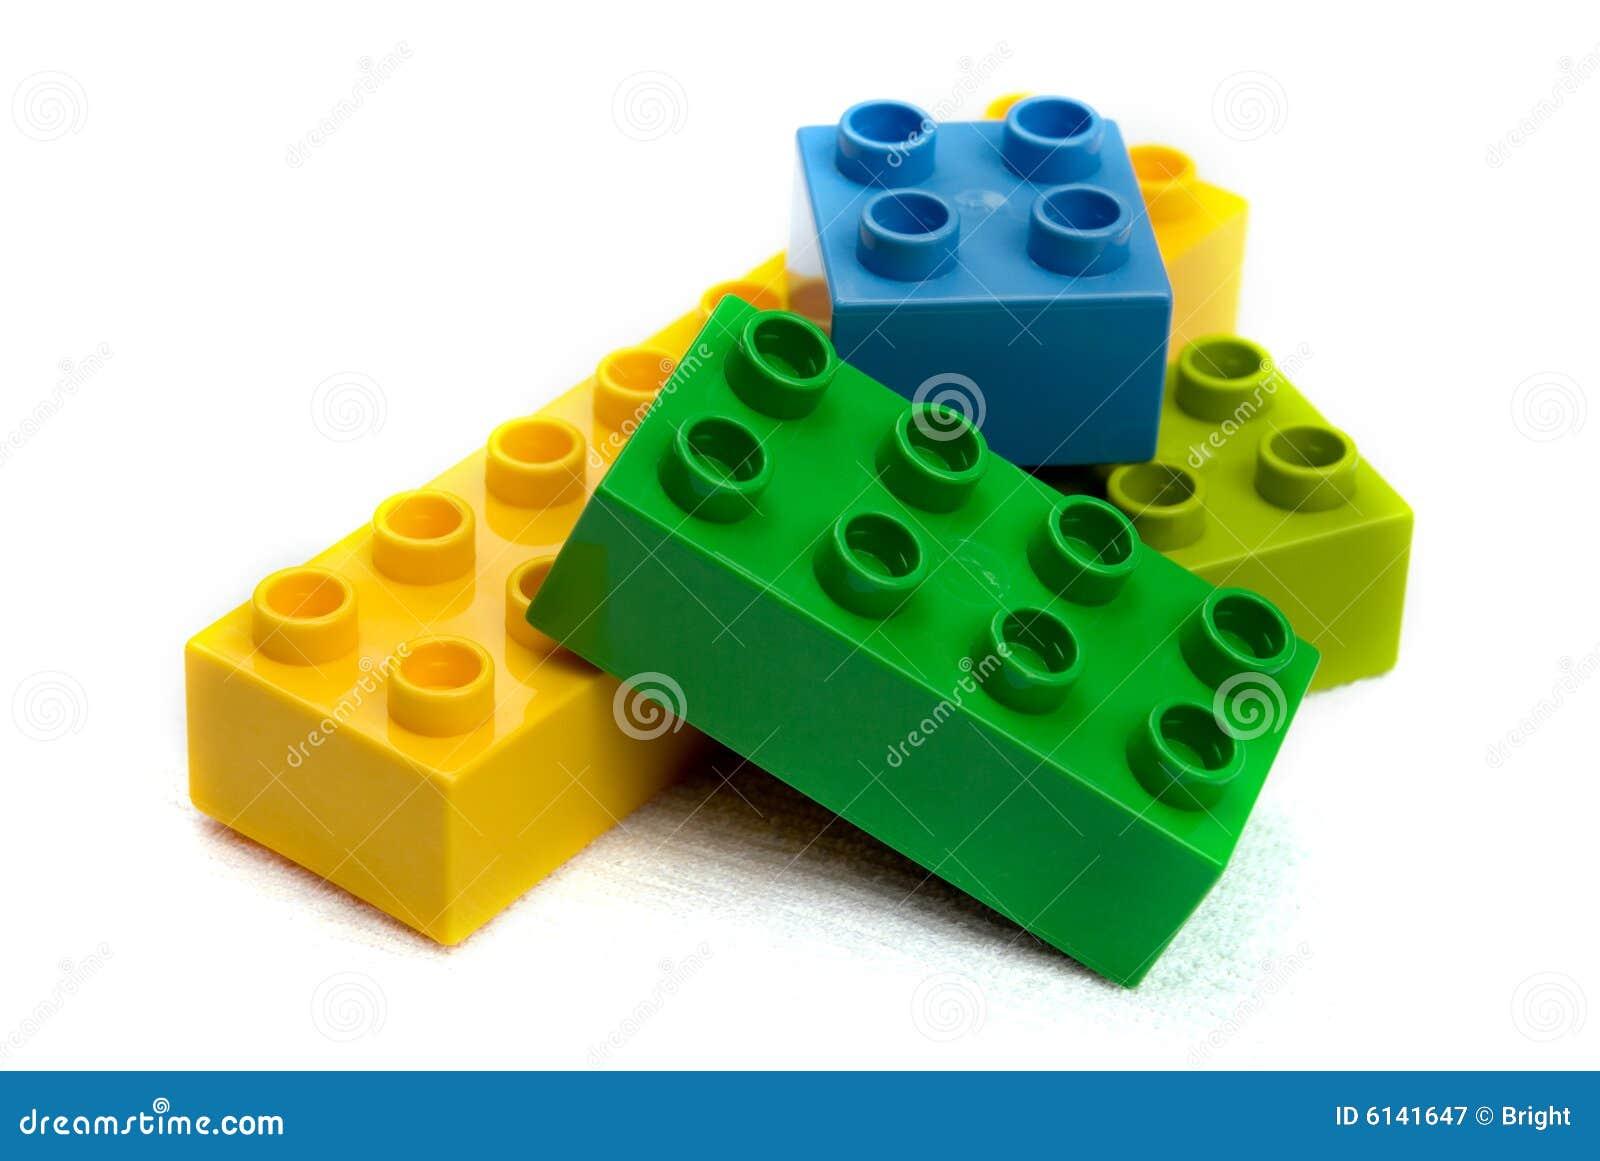 blocs de lego photographie stock libre de droits image 6141647. Black Bedroom Furniture Sets. Home Design Ideas